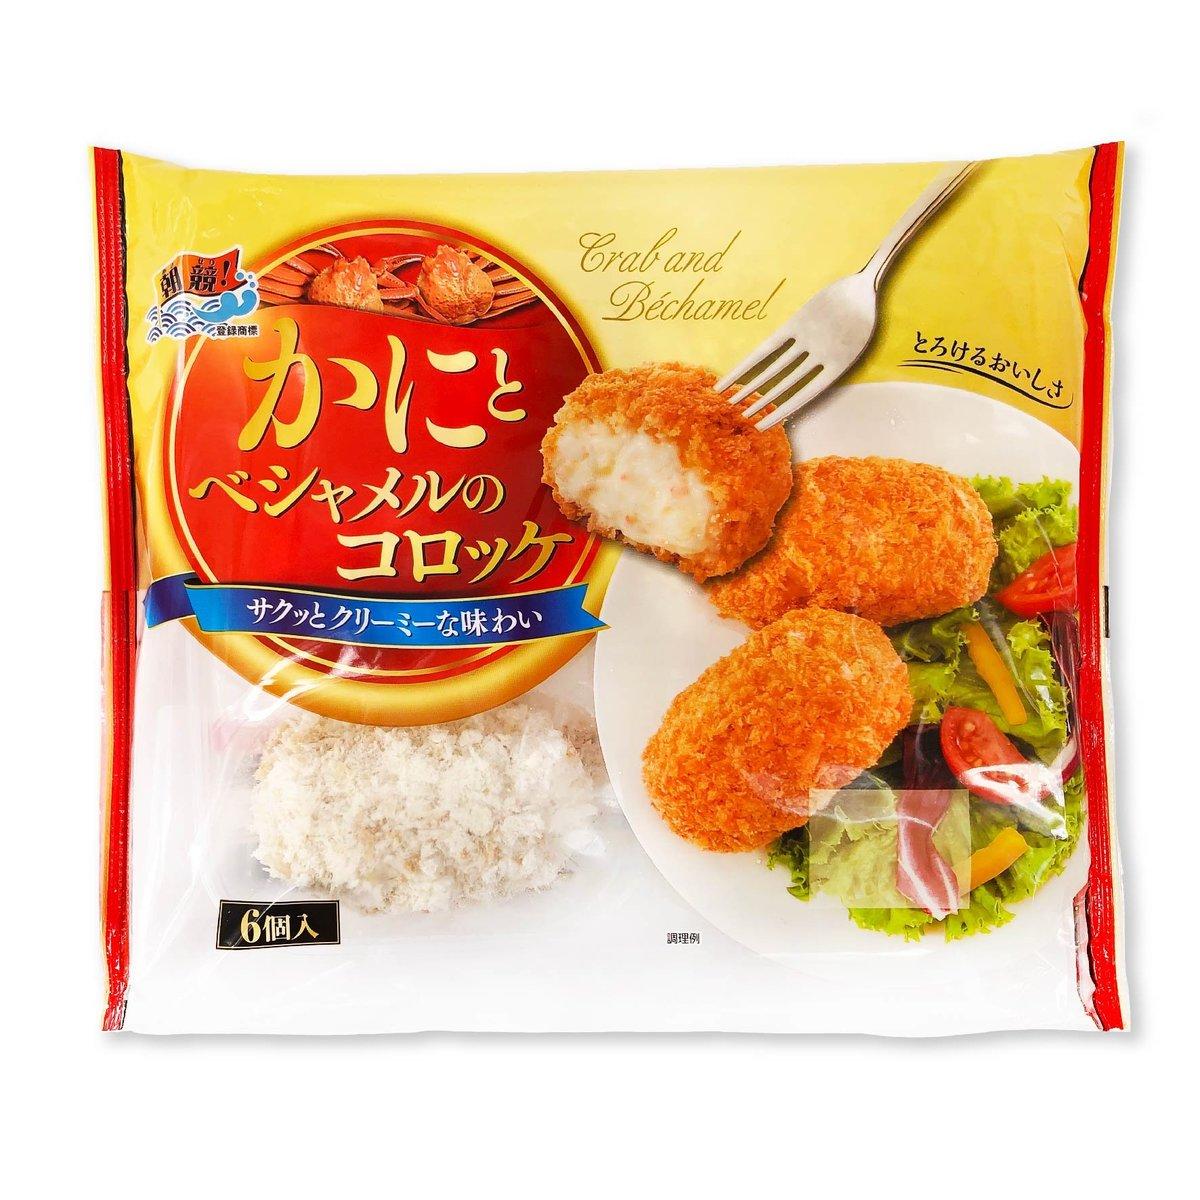 Japan Crab Hashbrowns